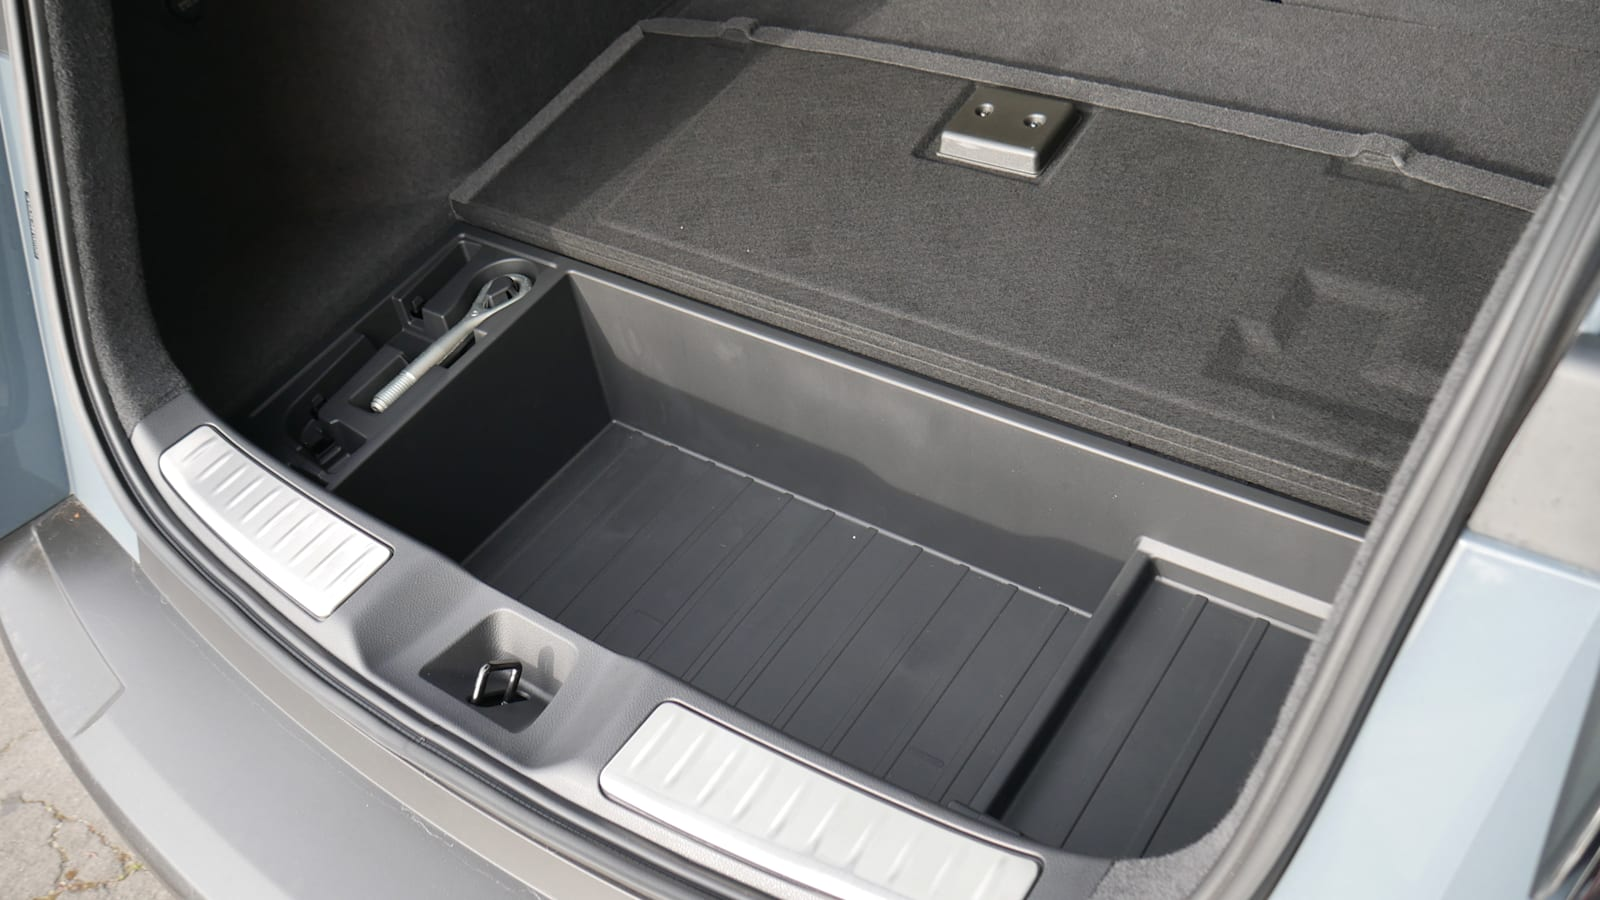 2021 Infiniti QX55 underfloor storage